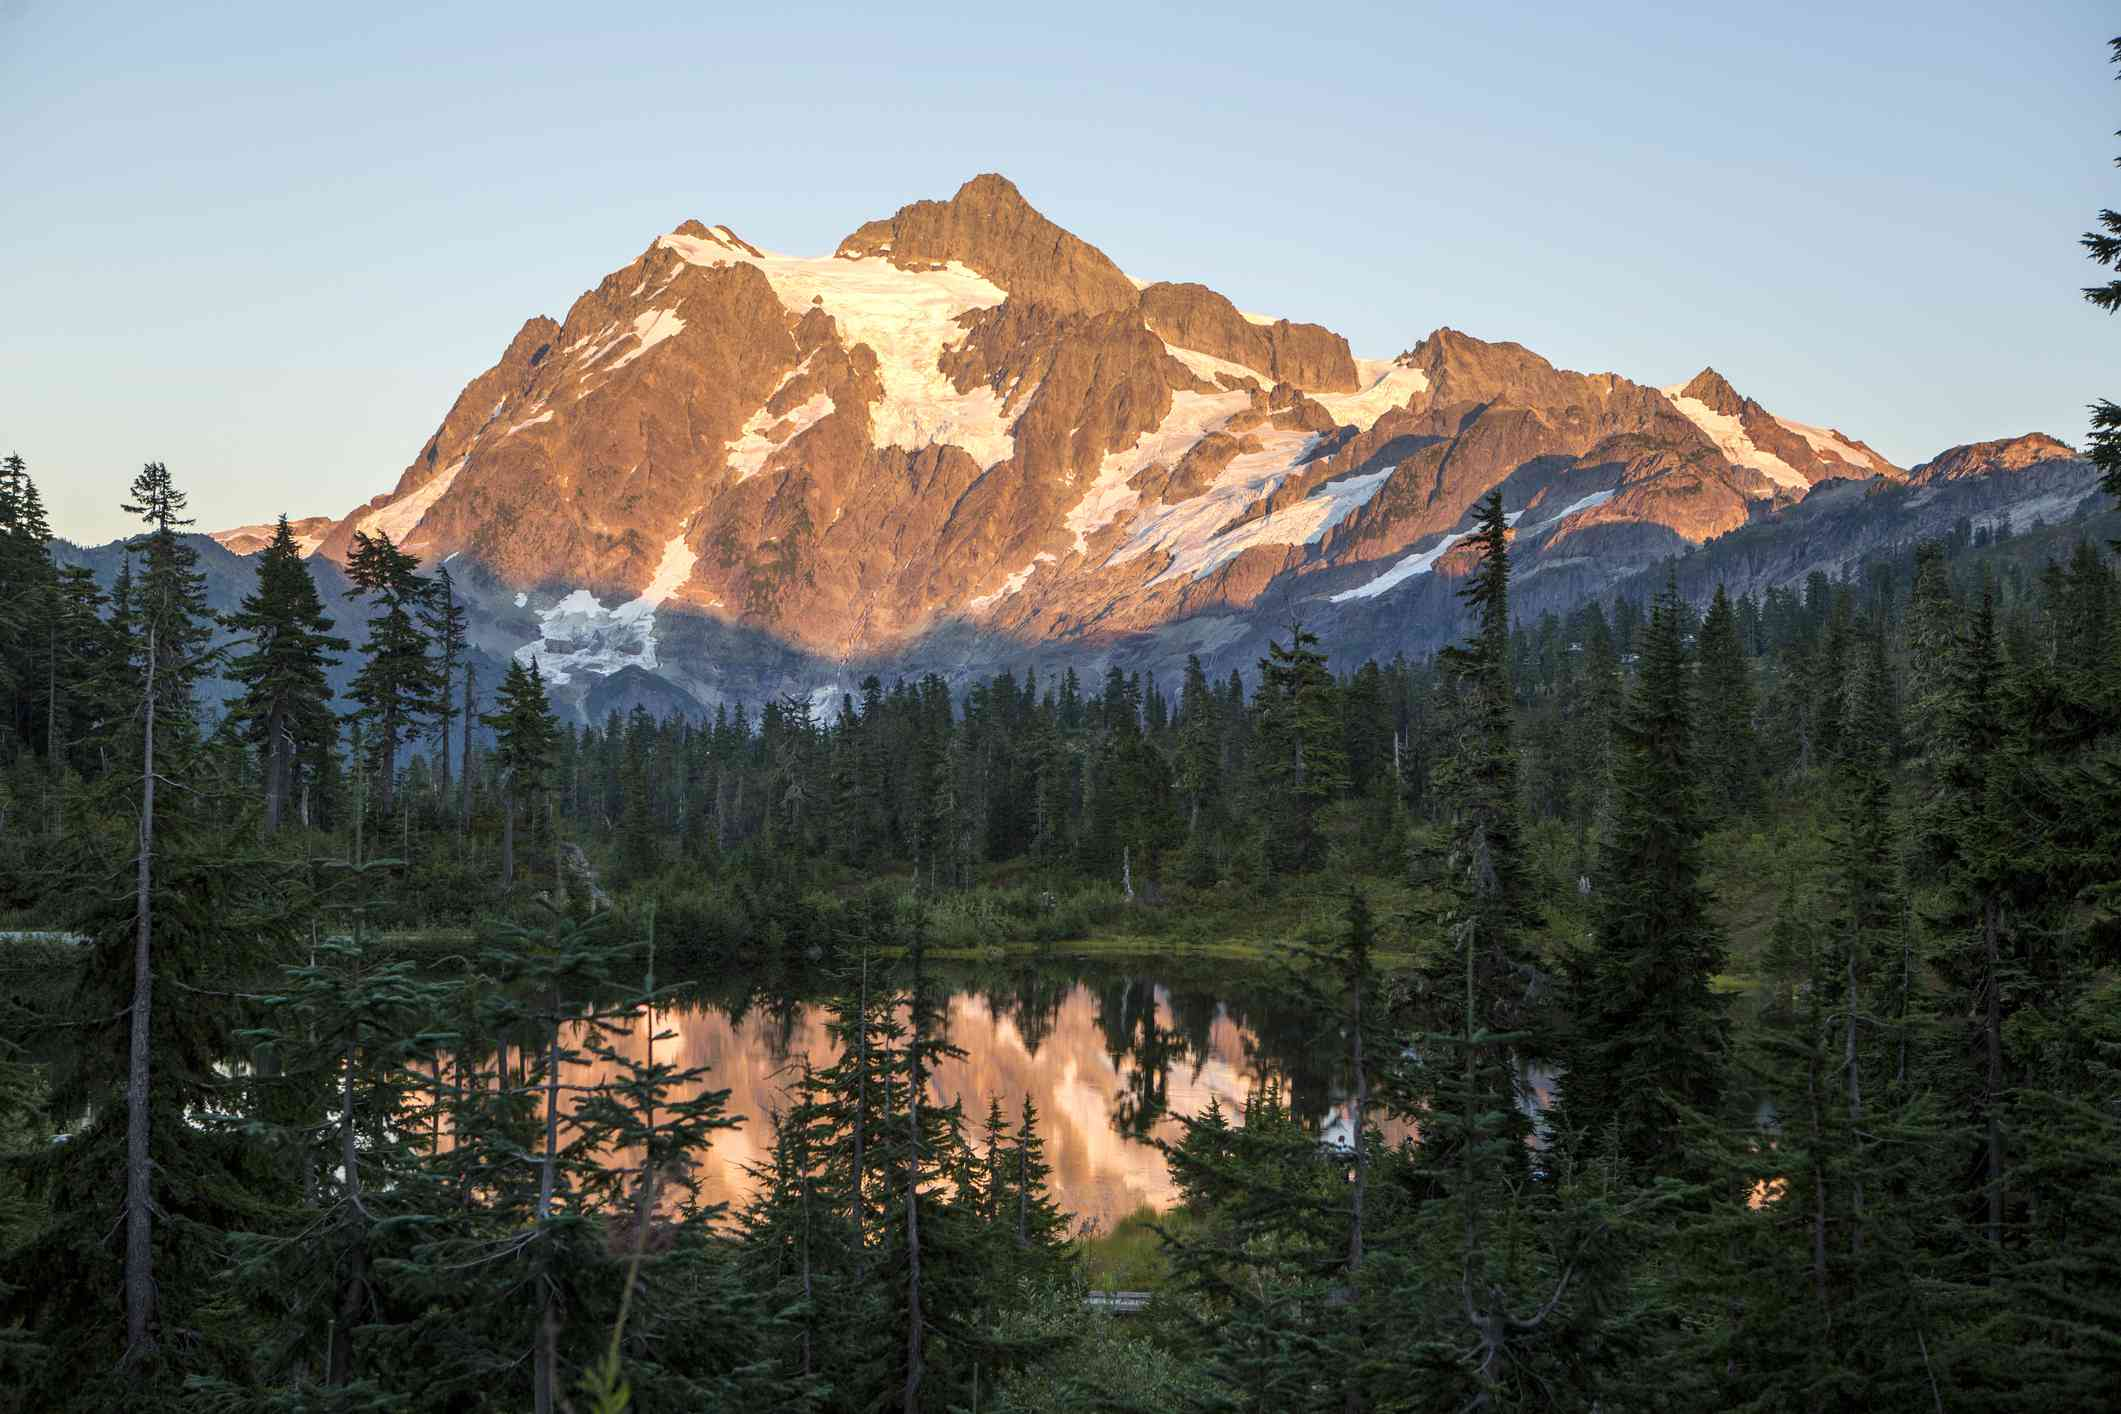 View of Mount Baker at dawn across a mountain lake